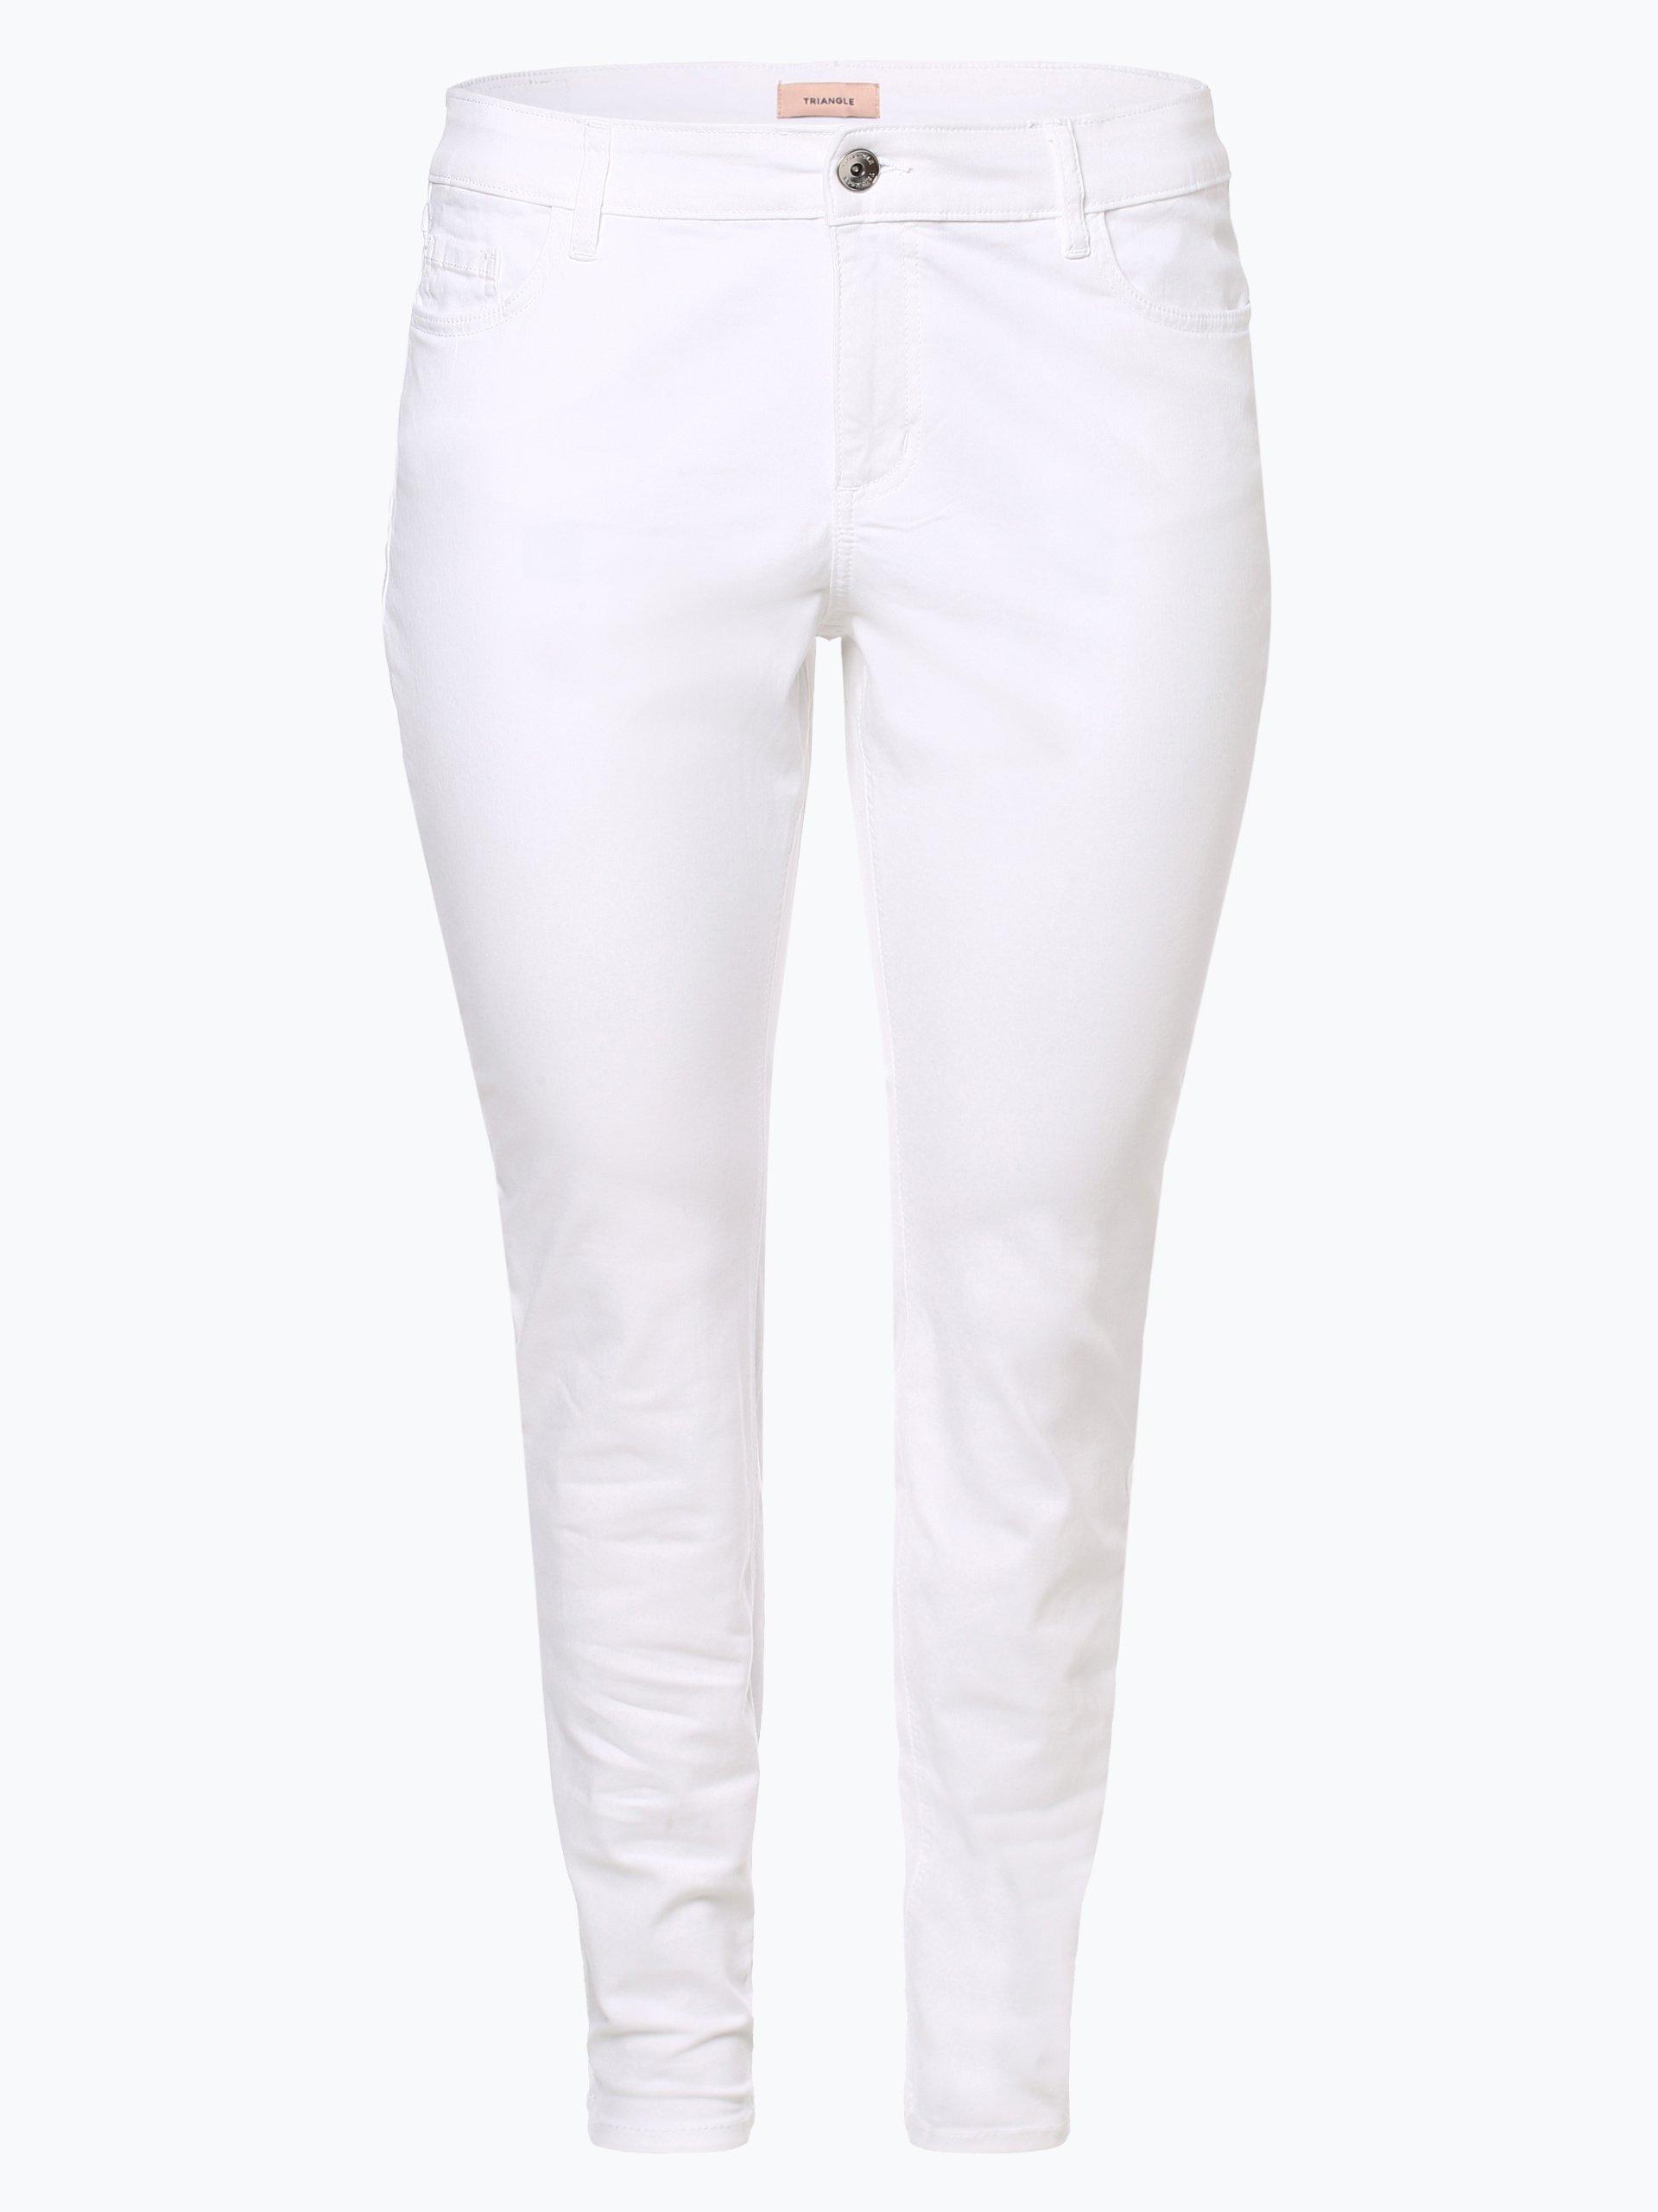 Triangle Spodnie damskie